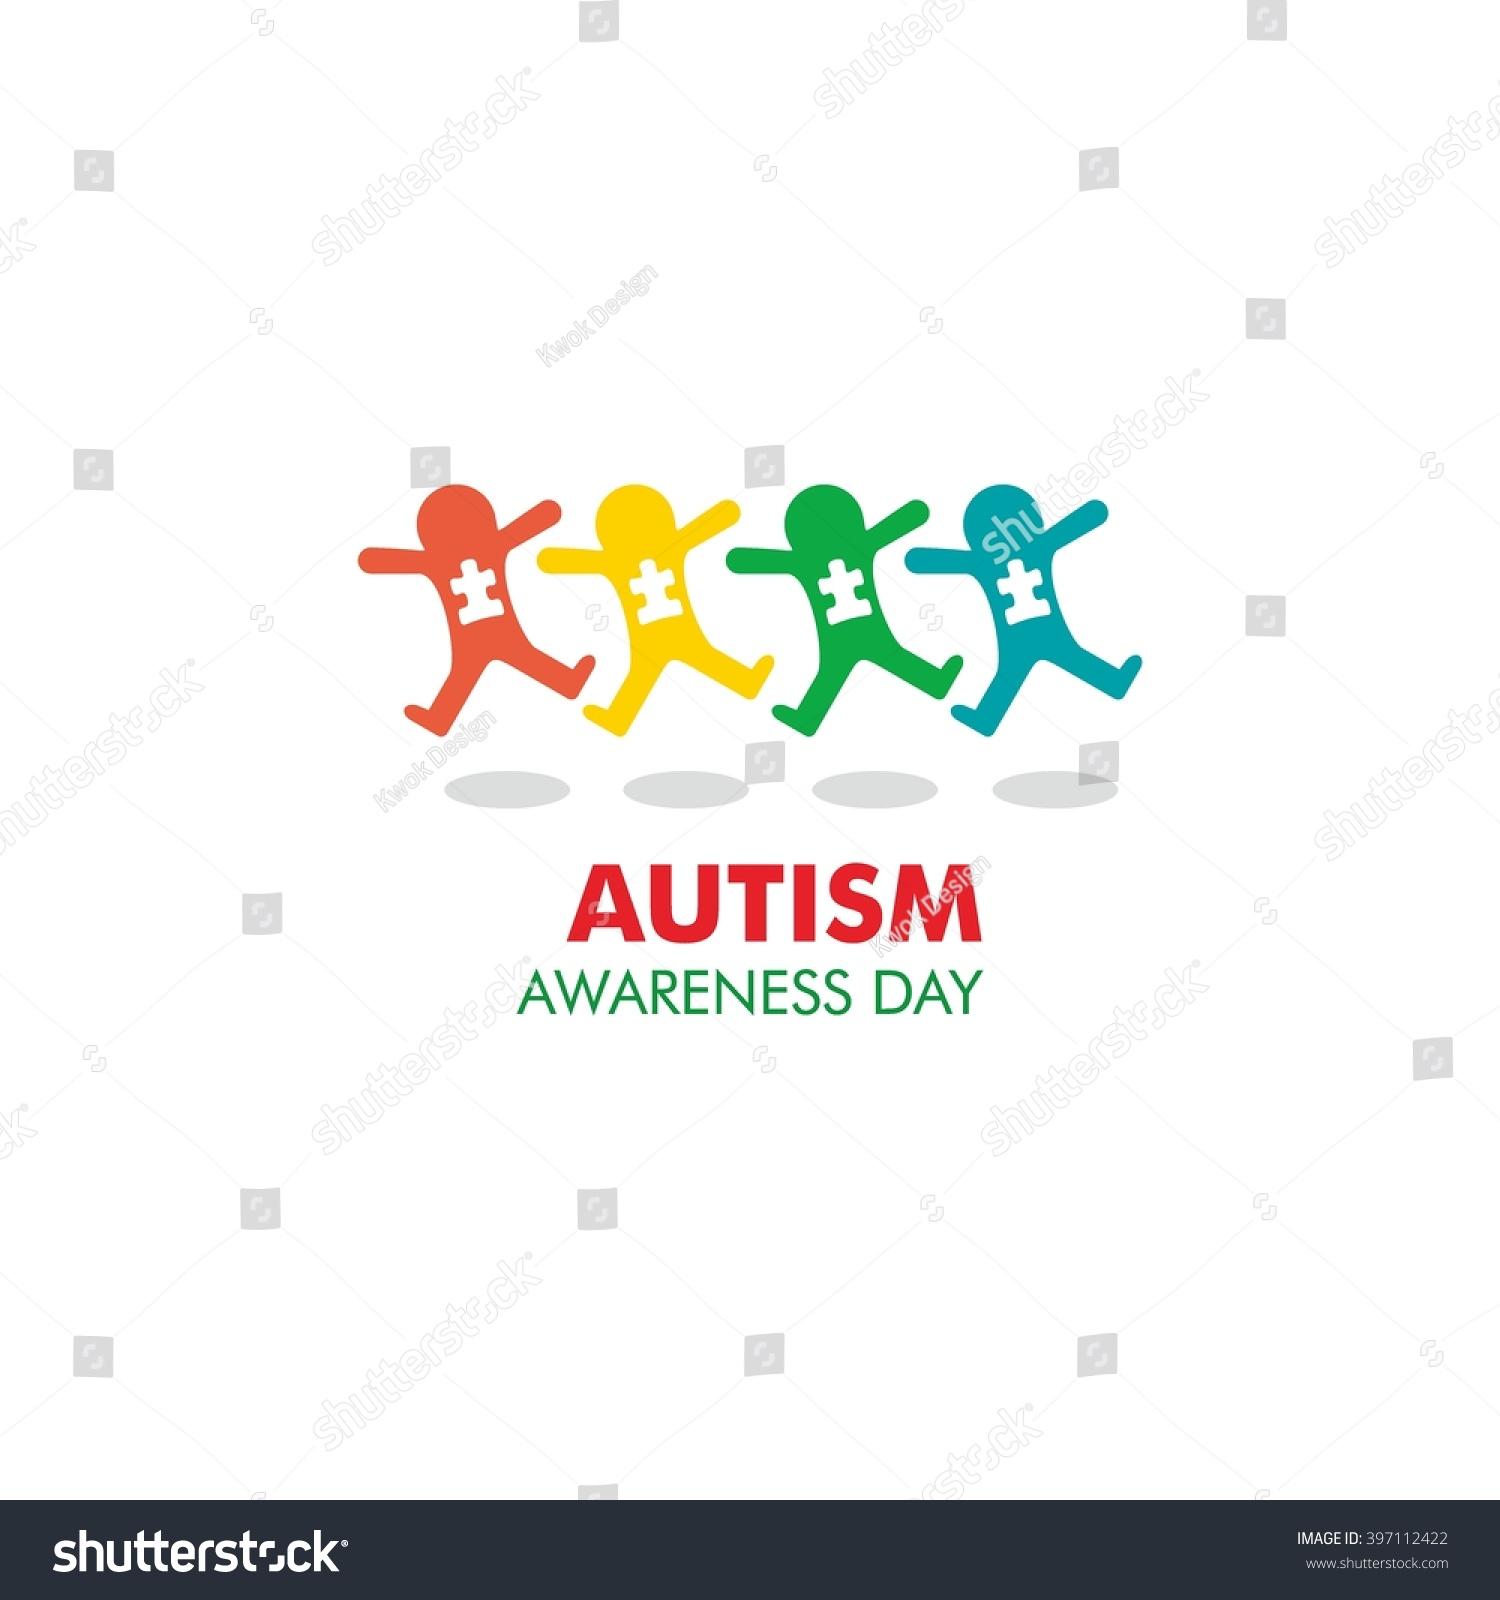 World autism awareness day logo design stock vector 397112422 world autism awareness day logo design template vector illustration colorful puzzles symbol biocorpaavc